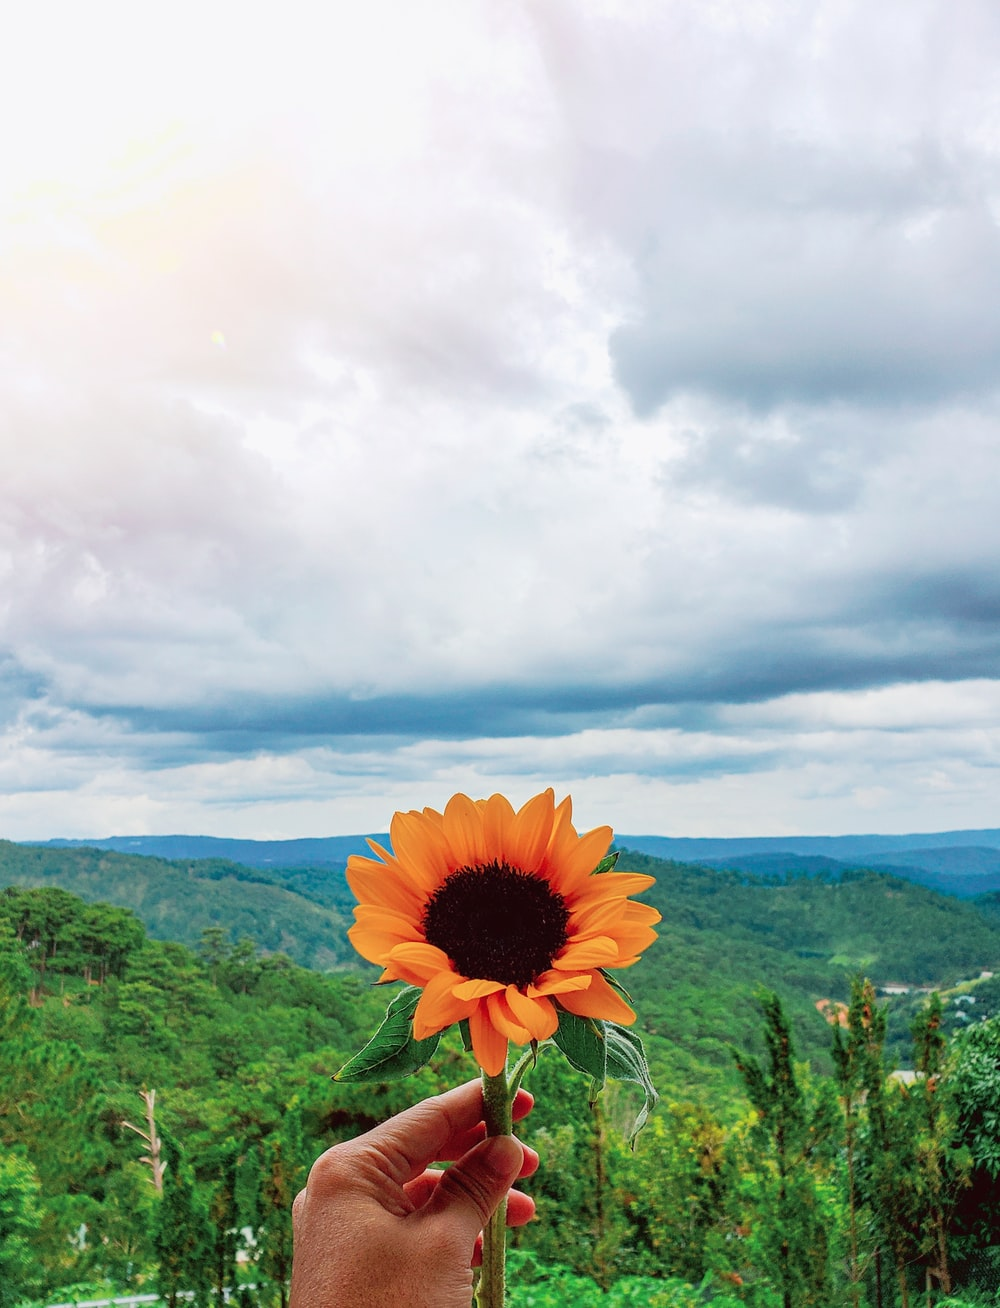 blooming orange sunflower